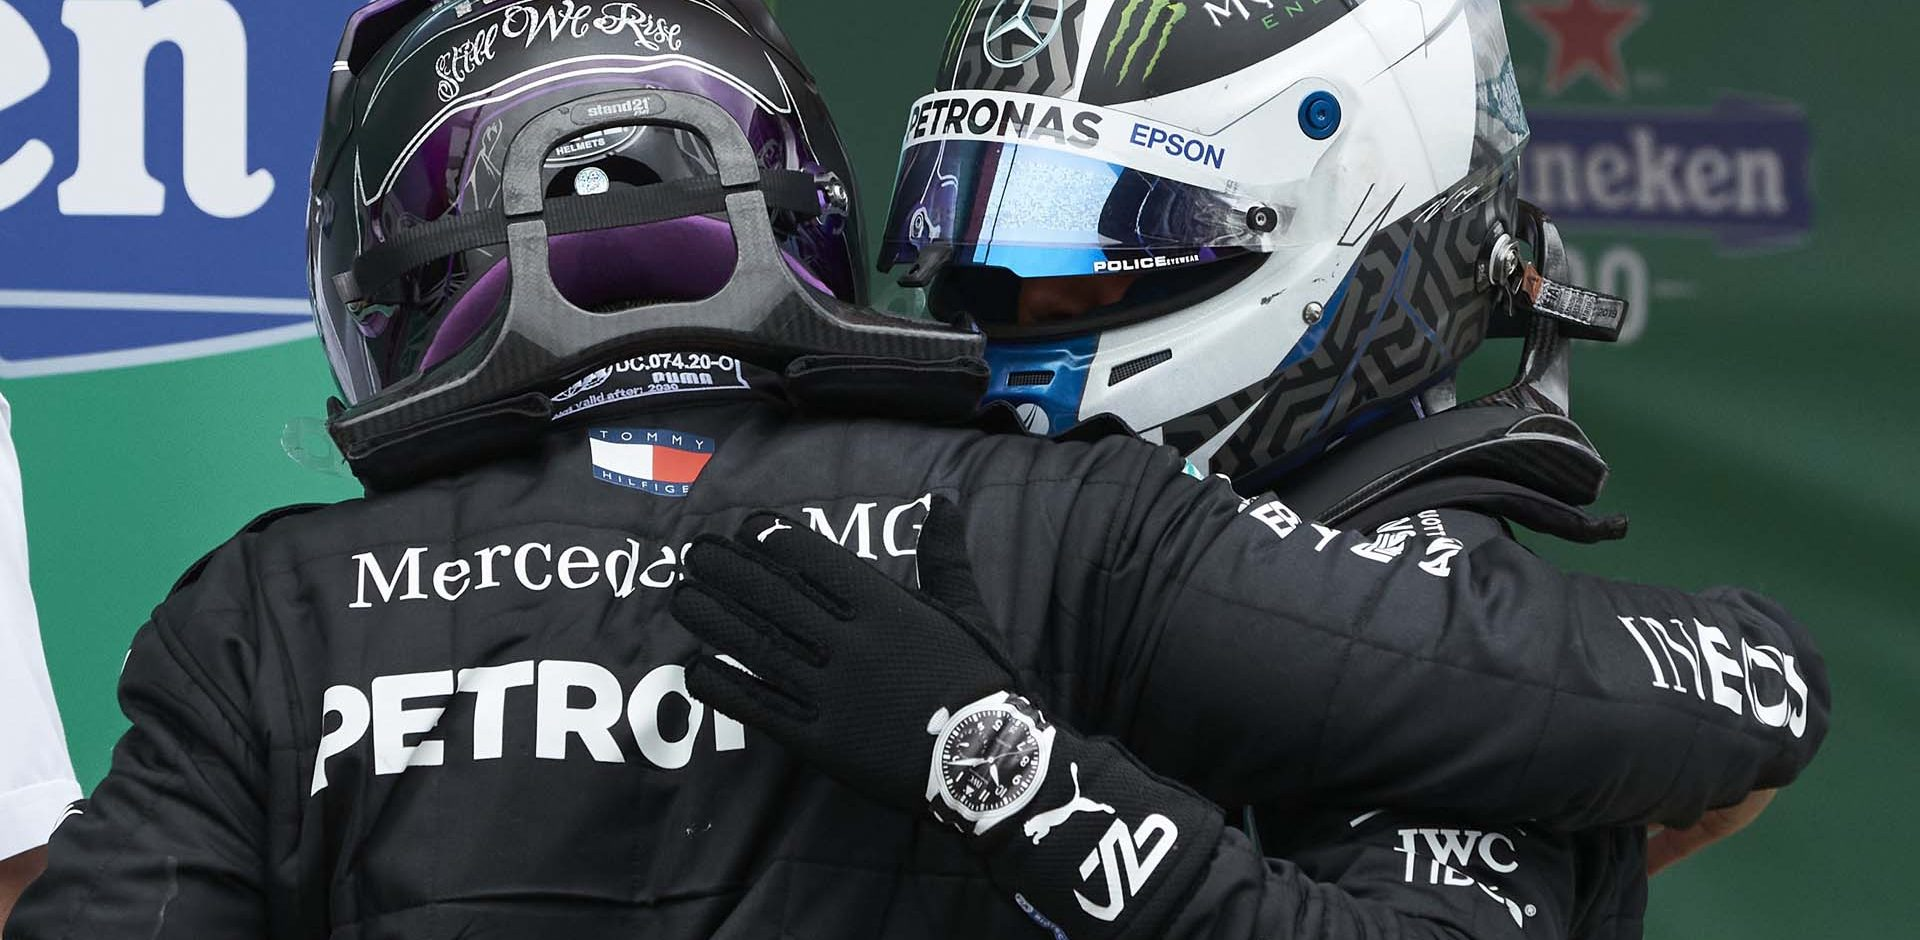 2020 Portuguese Grand Prix, Sunday - Steve Etherington Lewis Hamilton Valtteri Bottas Mercedes